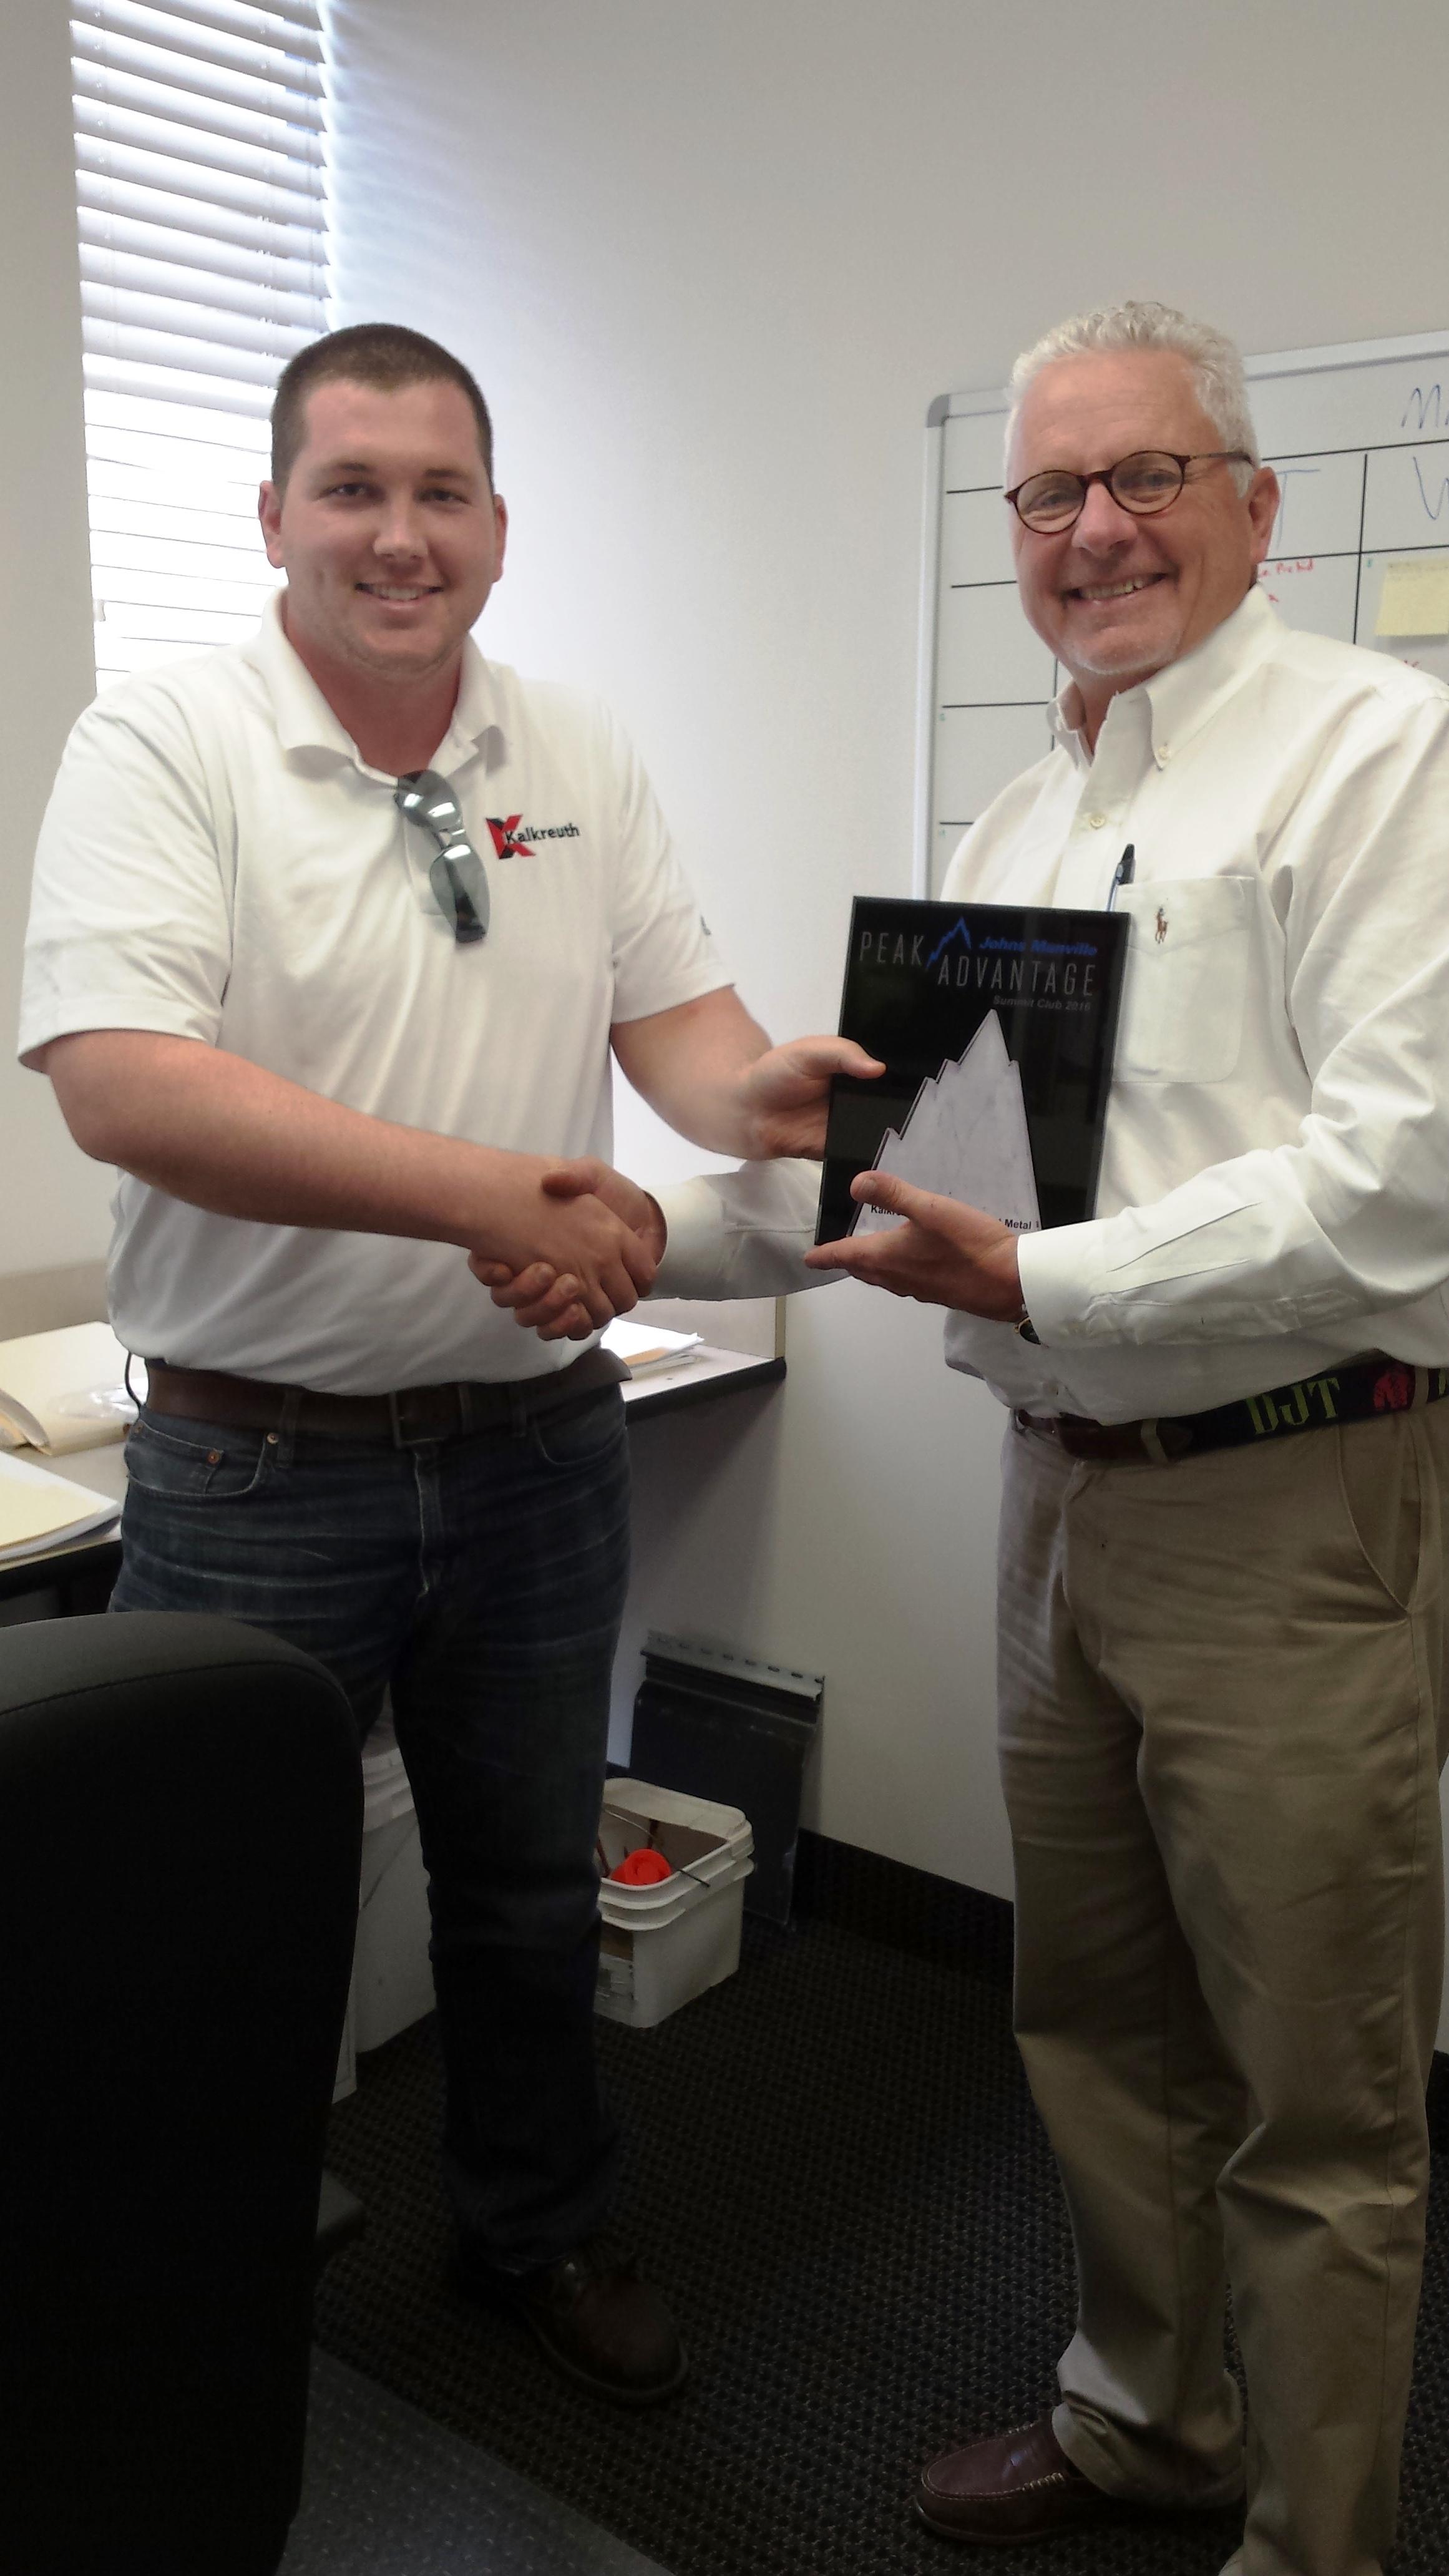 Kentucky Division Earns Jm Summit Club Achievement